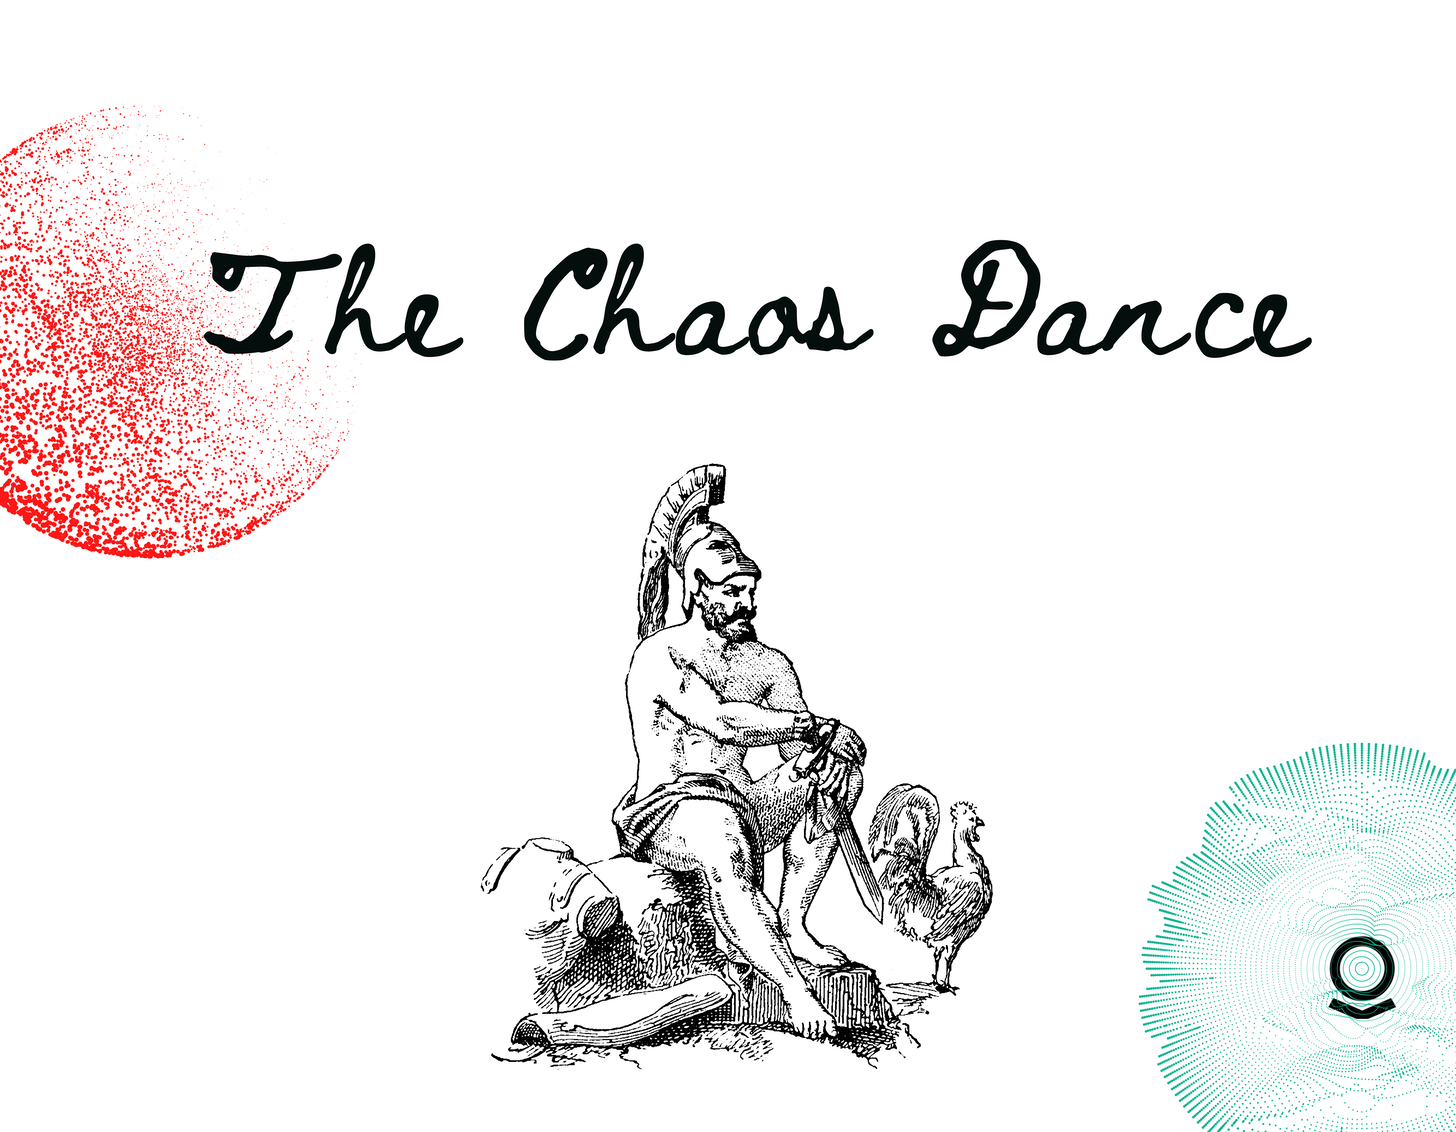 Palantir and the Chaos Dance